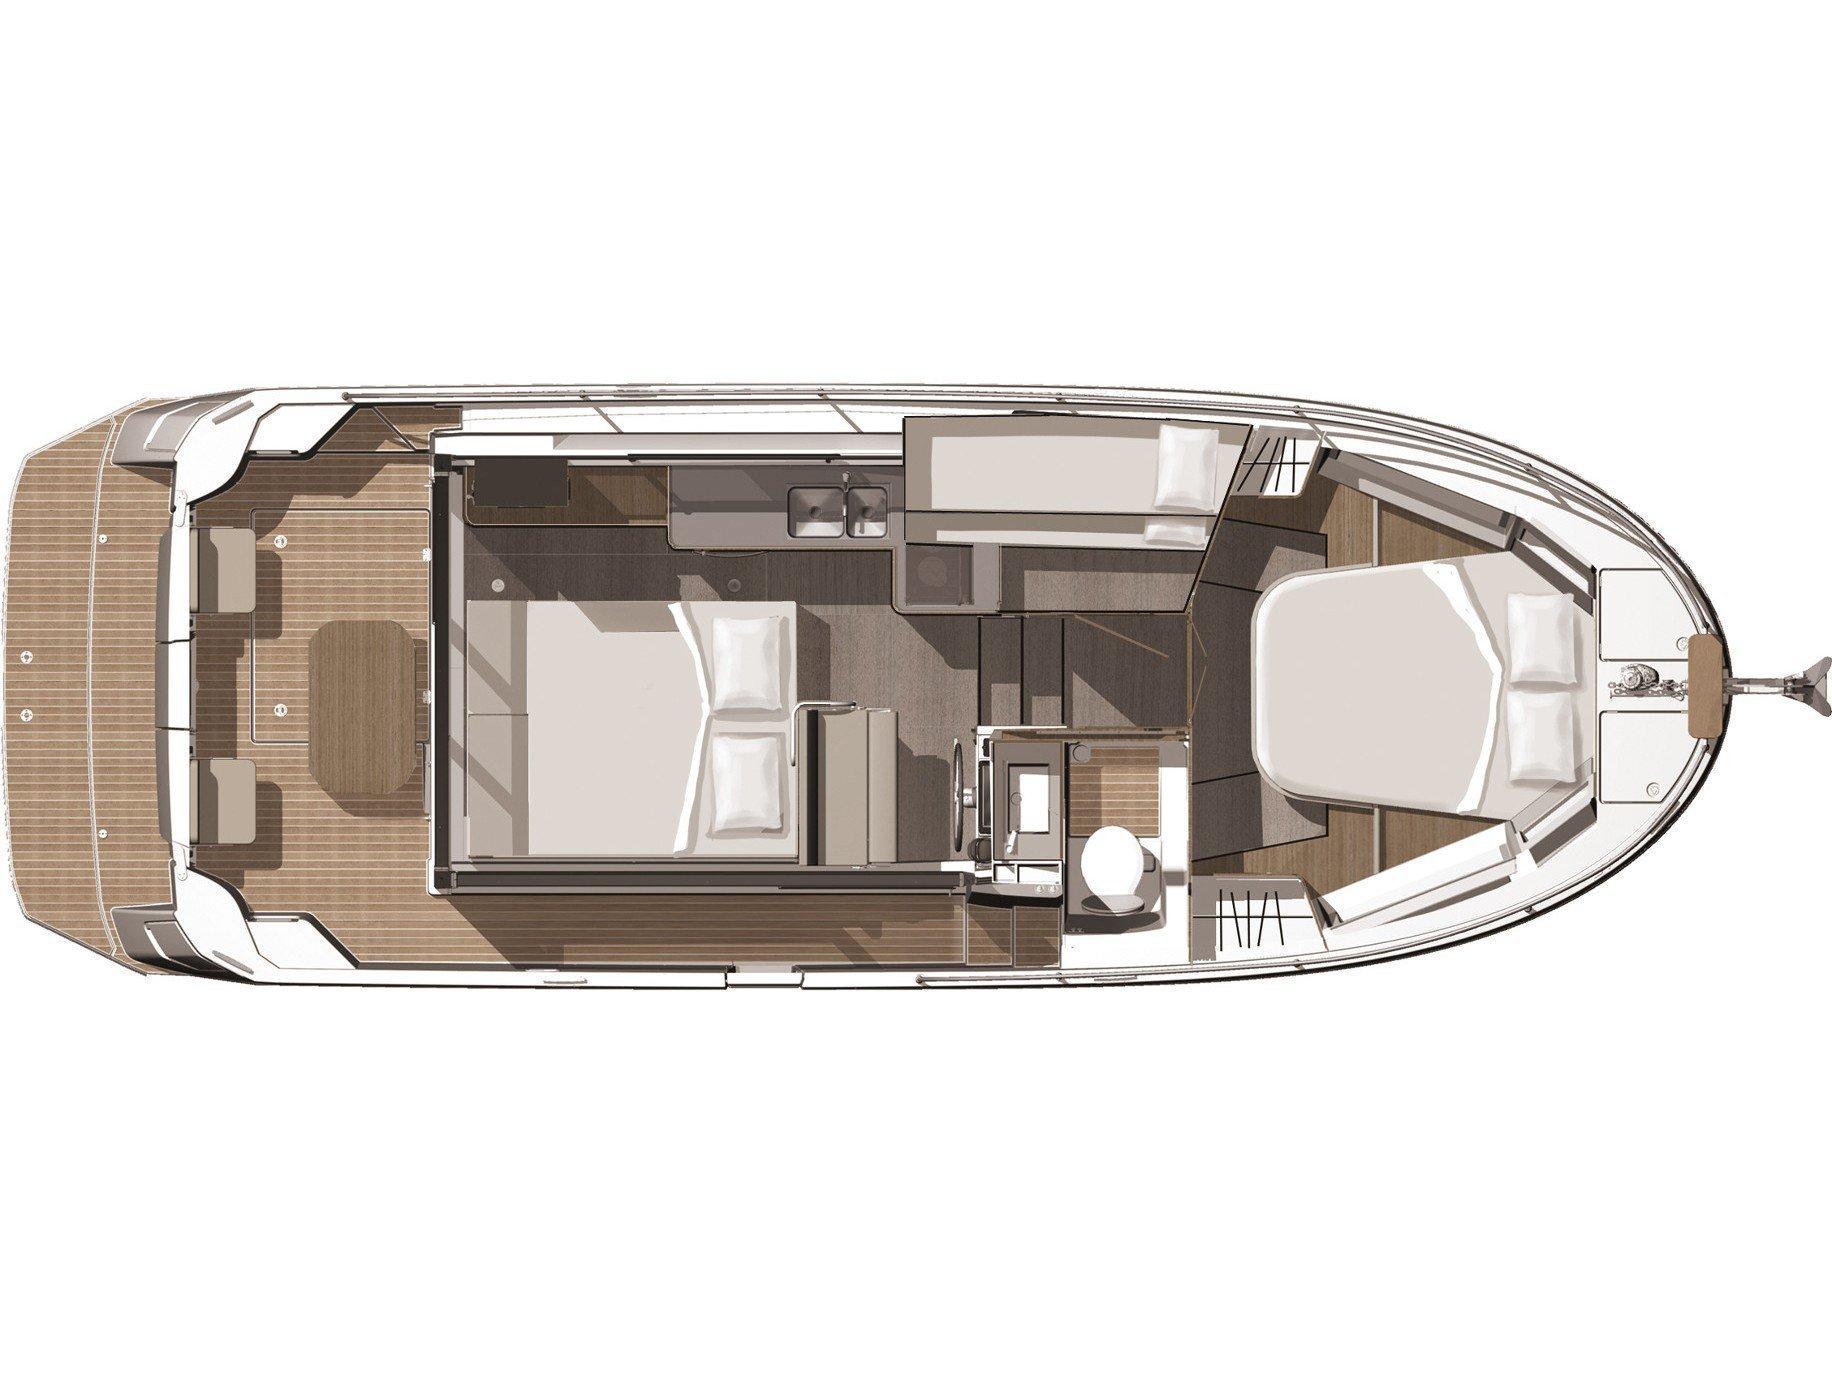 Beneteau Swift Trawler 30 (Odysseus) Plan image - 6